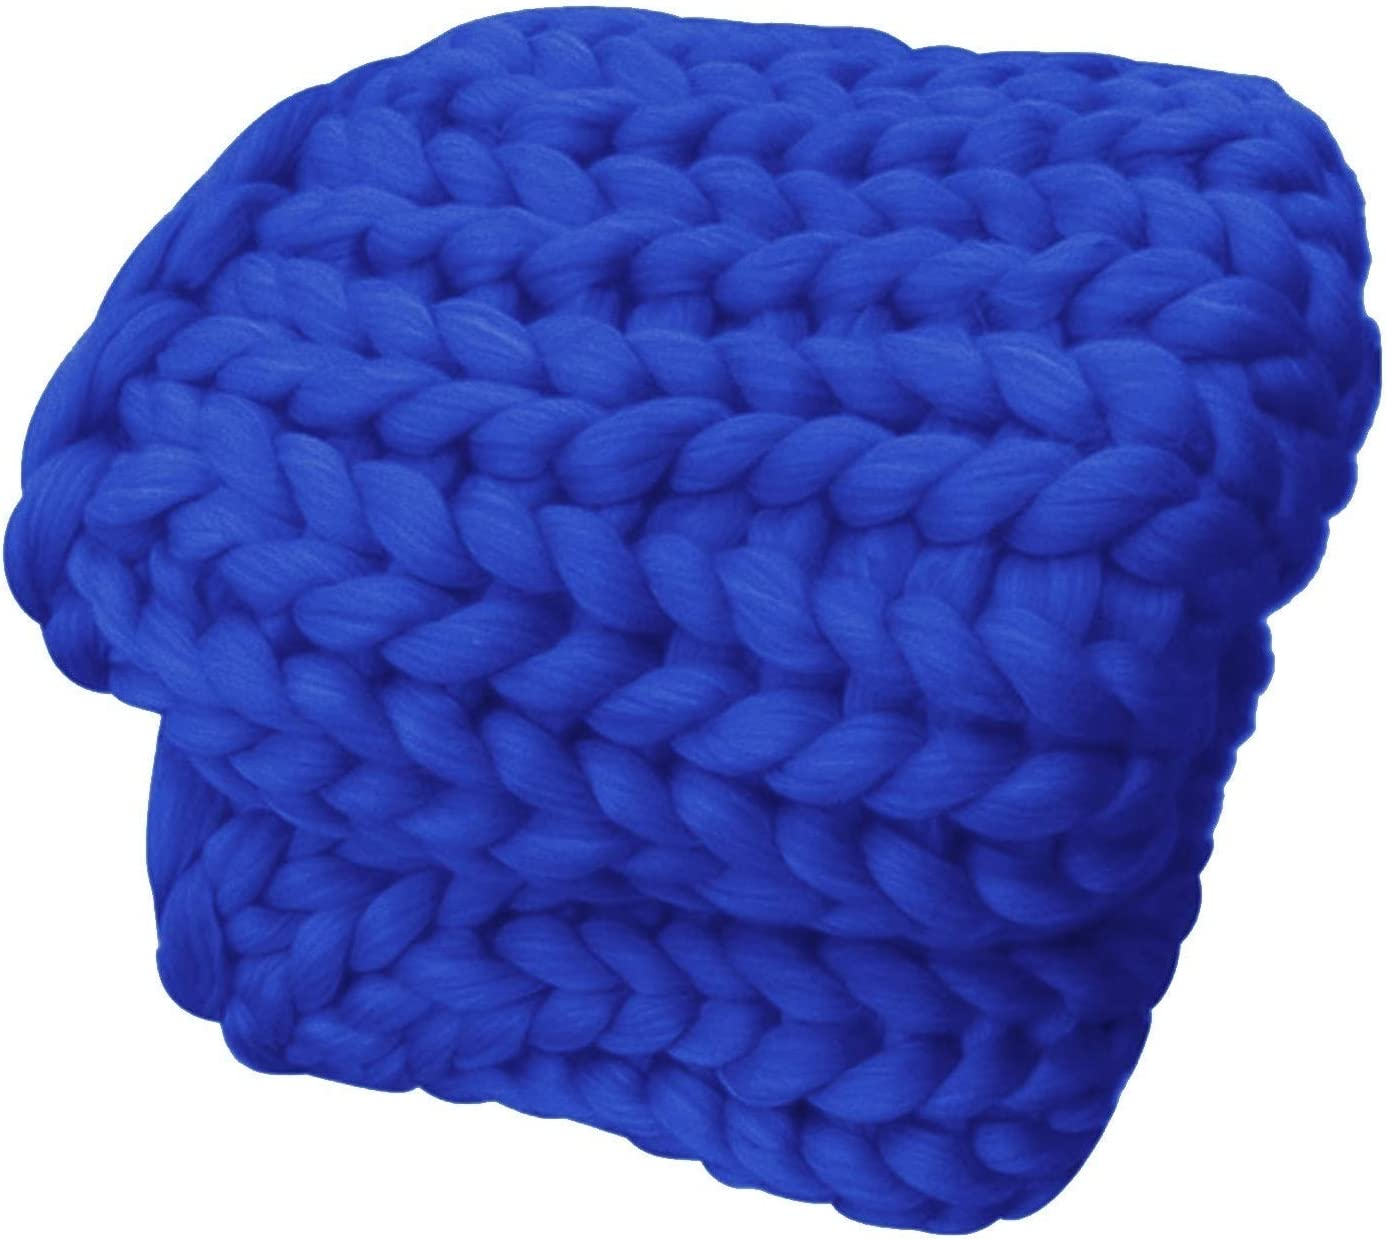 MZP Atlanta Mall Chunky Knit Blanket for Super Bla Soft Arlington Mall Bed Throw